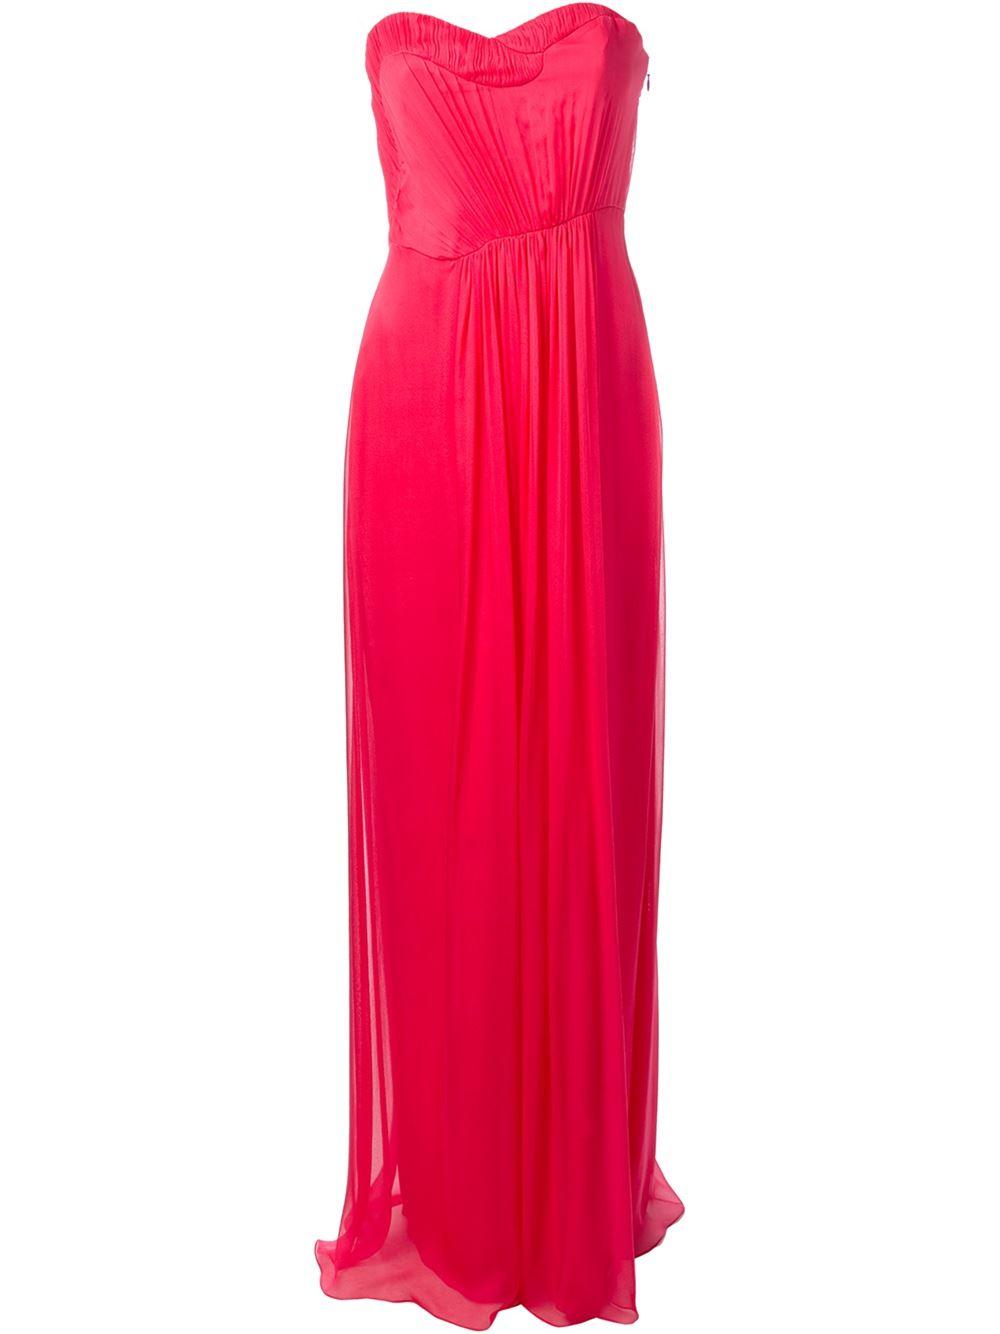 فستان وردي من ماثيو ويليامسون matthew williamson